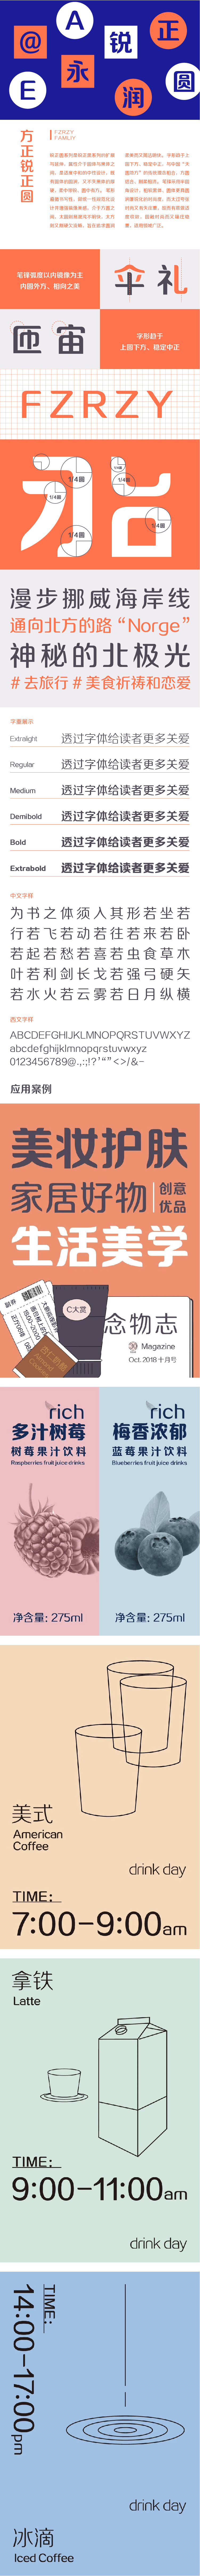 https://cdn1.zijia.com.cn/Public/Uploads/mainsort/mainsort_1586488349_5826.jpg